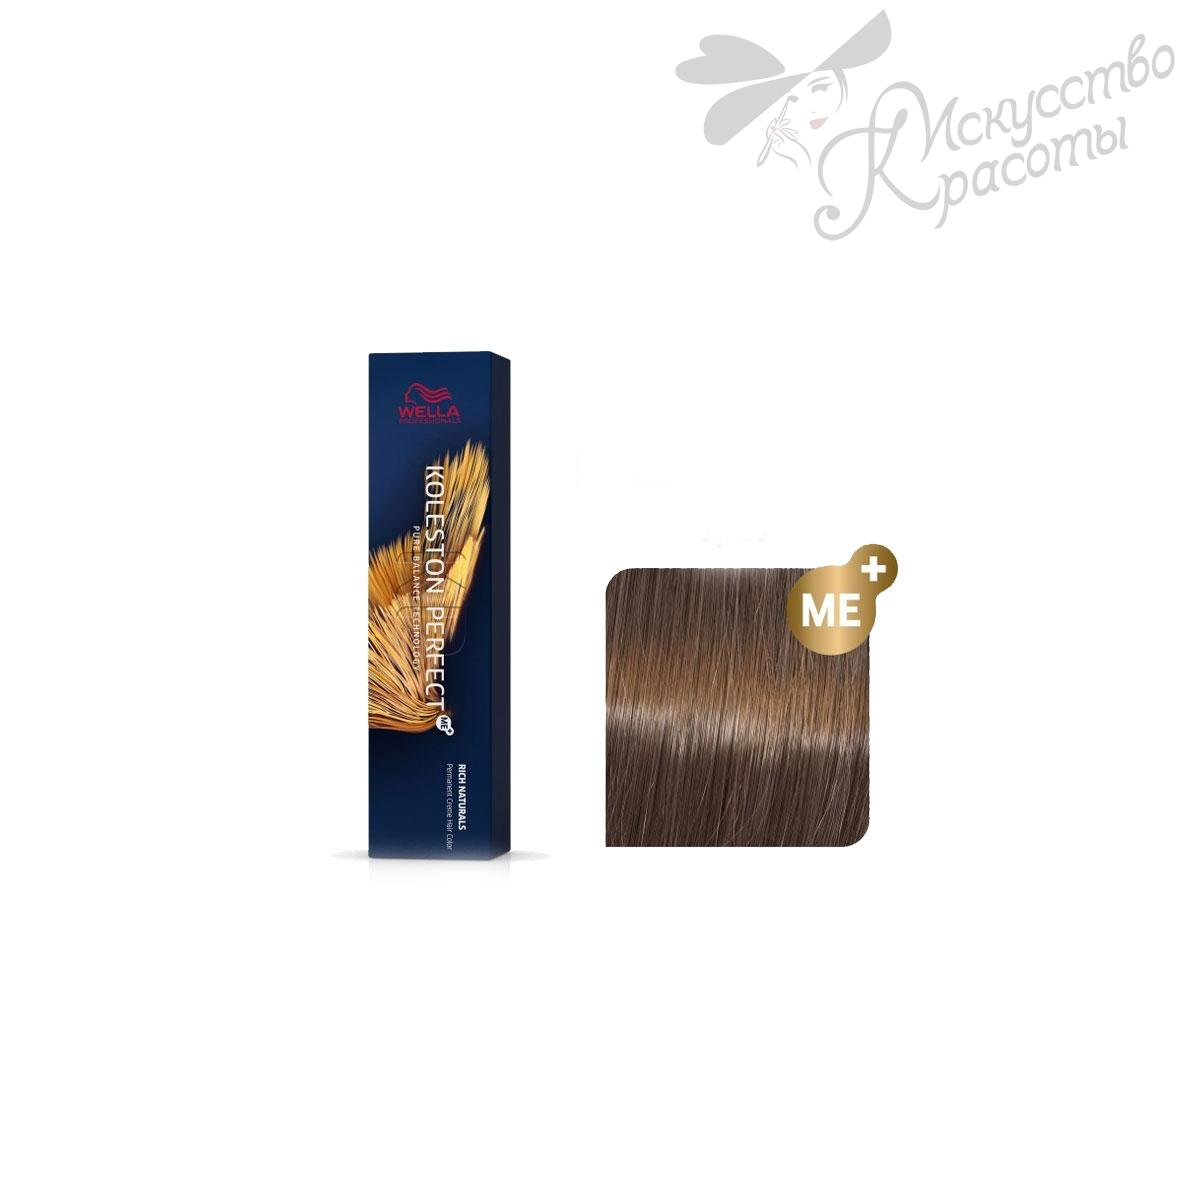 Wella Koleston 7/17 средний блондин пепельно-коричневый 60 мл